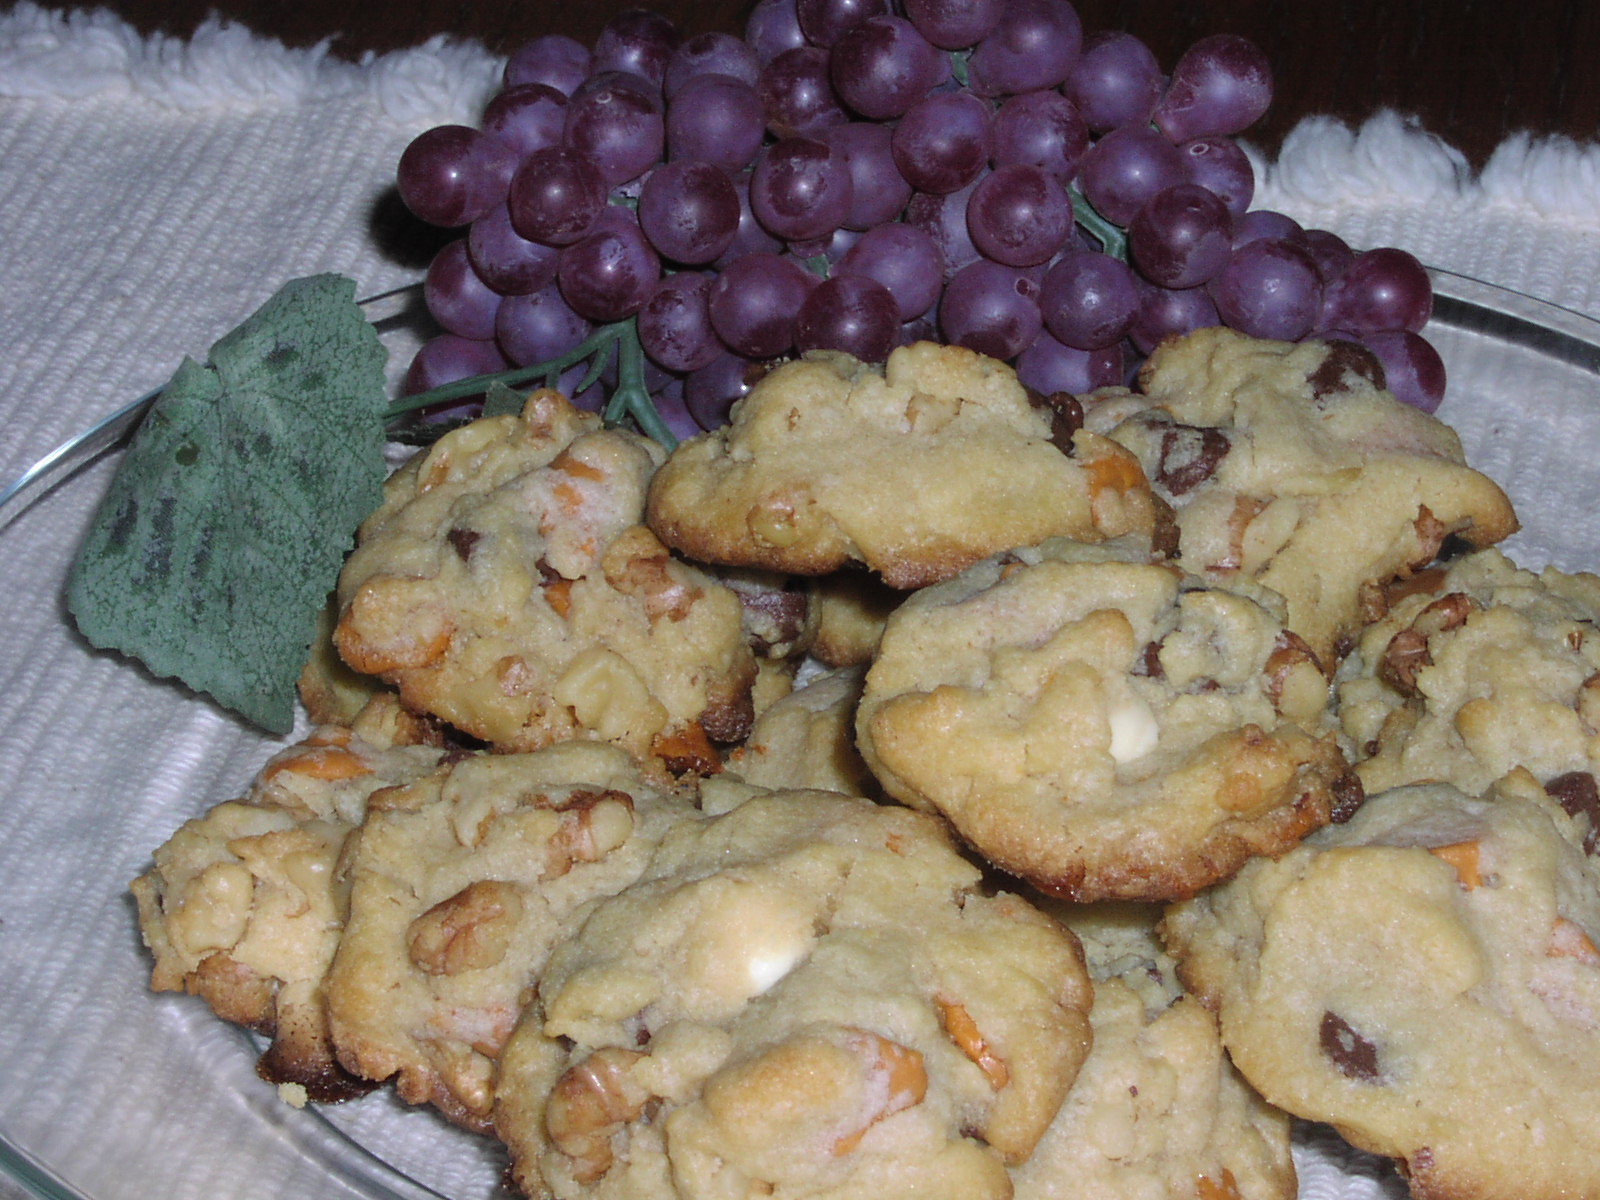 Betty Crocker Chocolate Chip Cookies (1971-Men's Favorites #22)